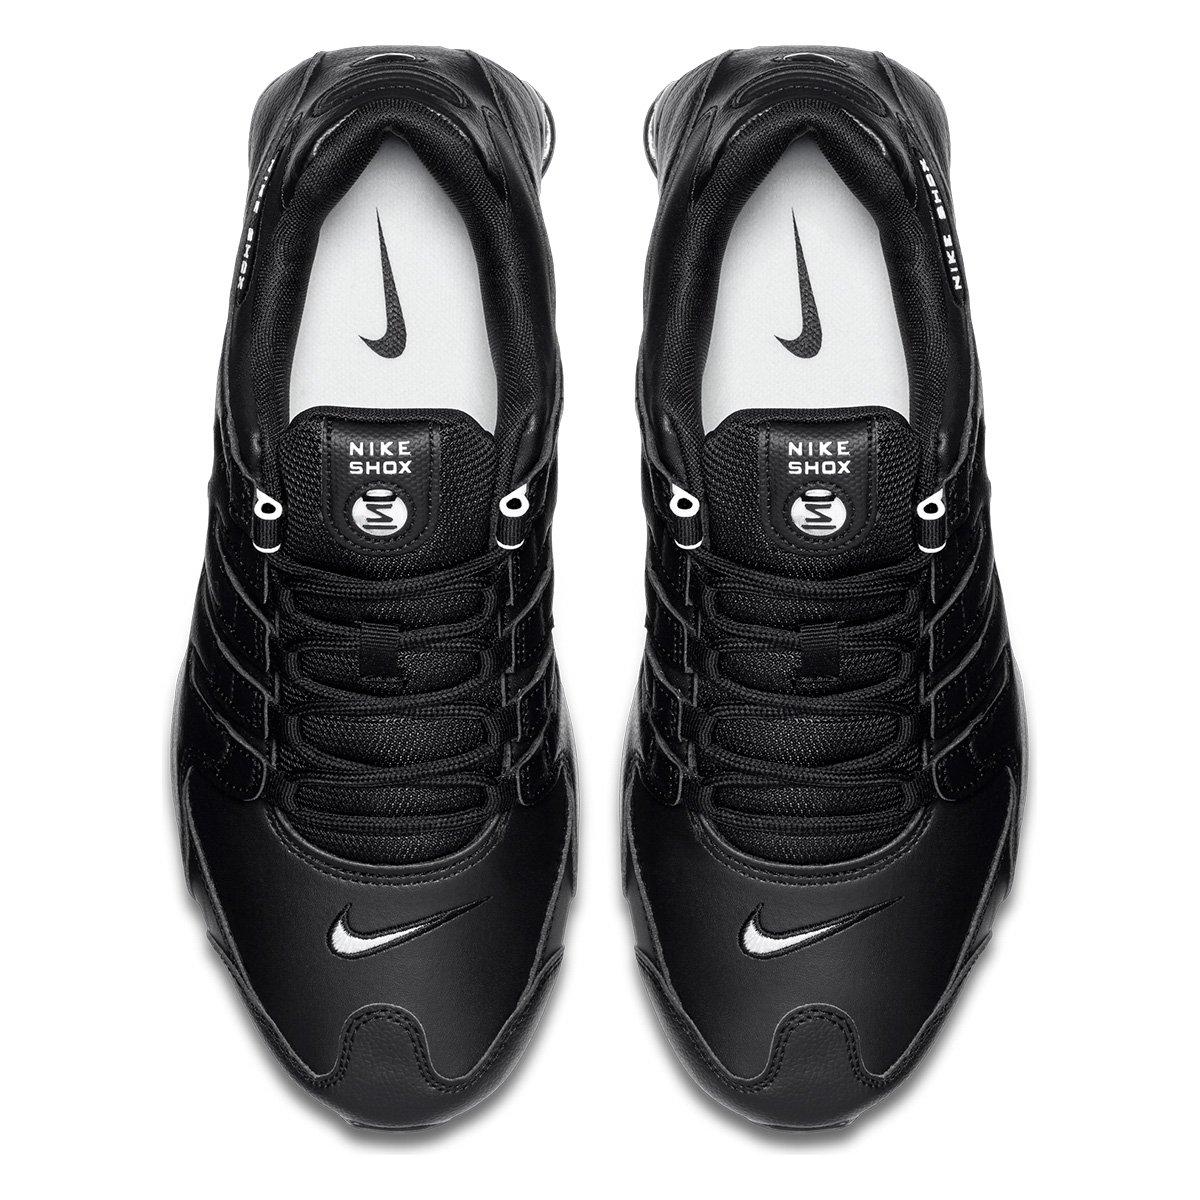 Tênis Nike Shox Nz Eu Masculino - Tam: 38 - 3